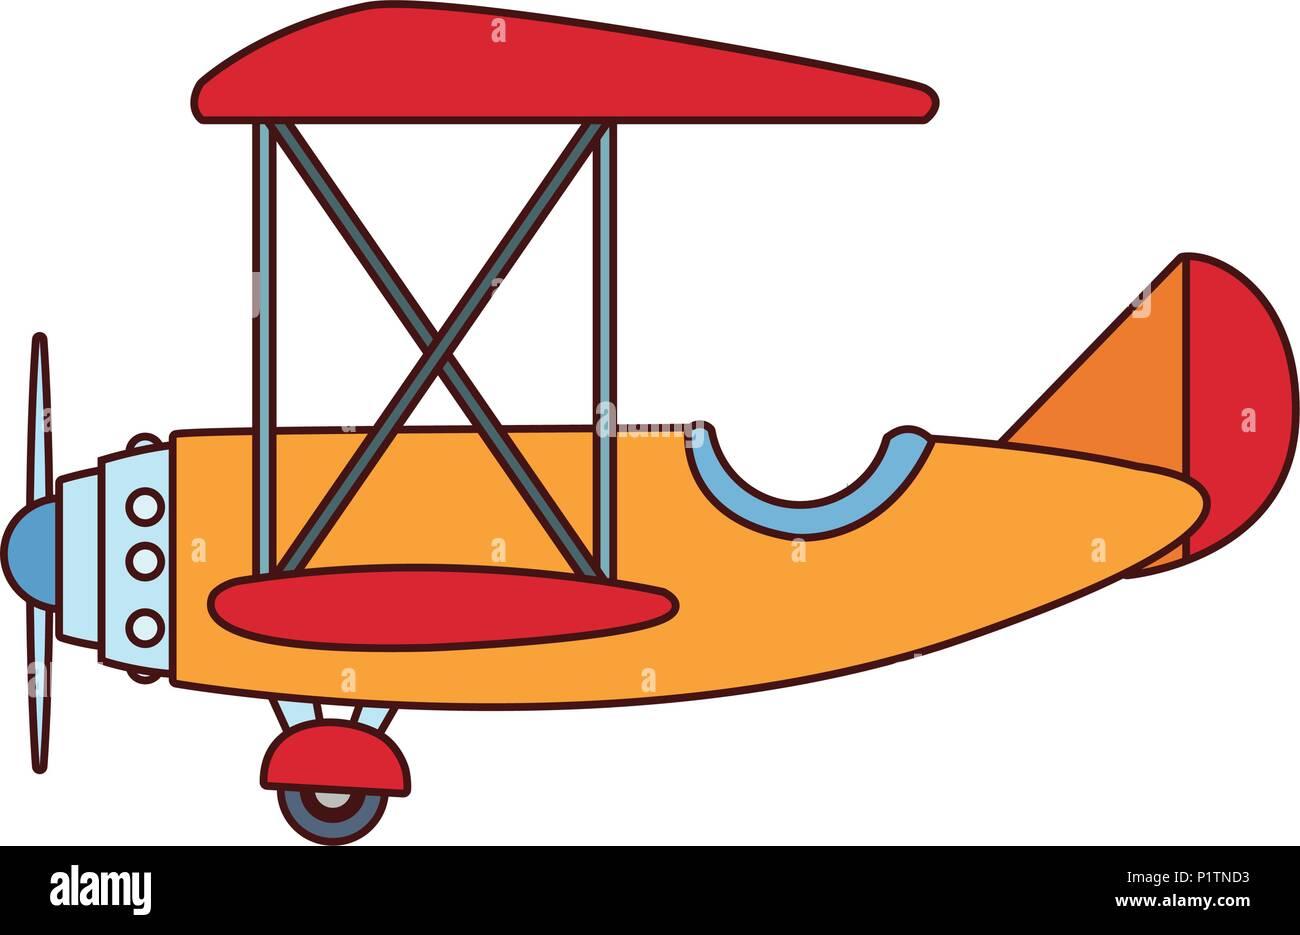 Vintage airplane cartoon Stock Vector Art & Illustration, Vector